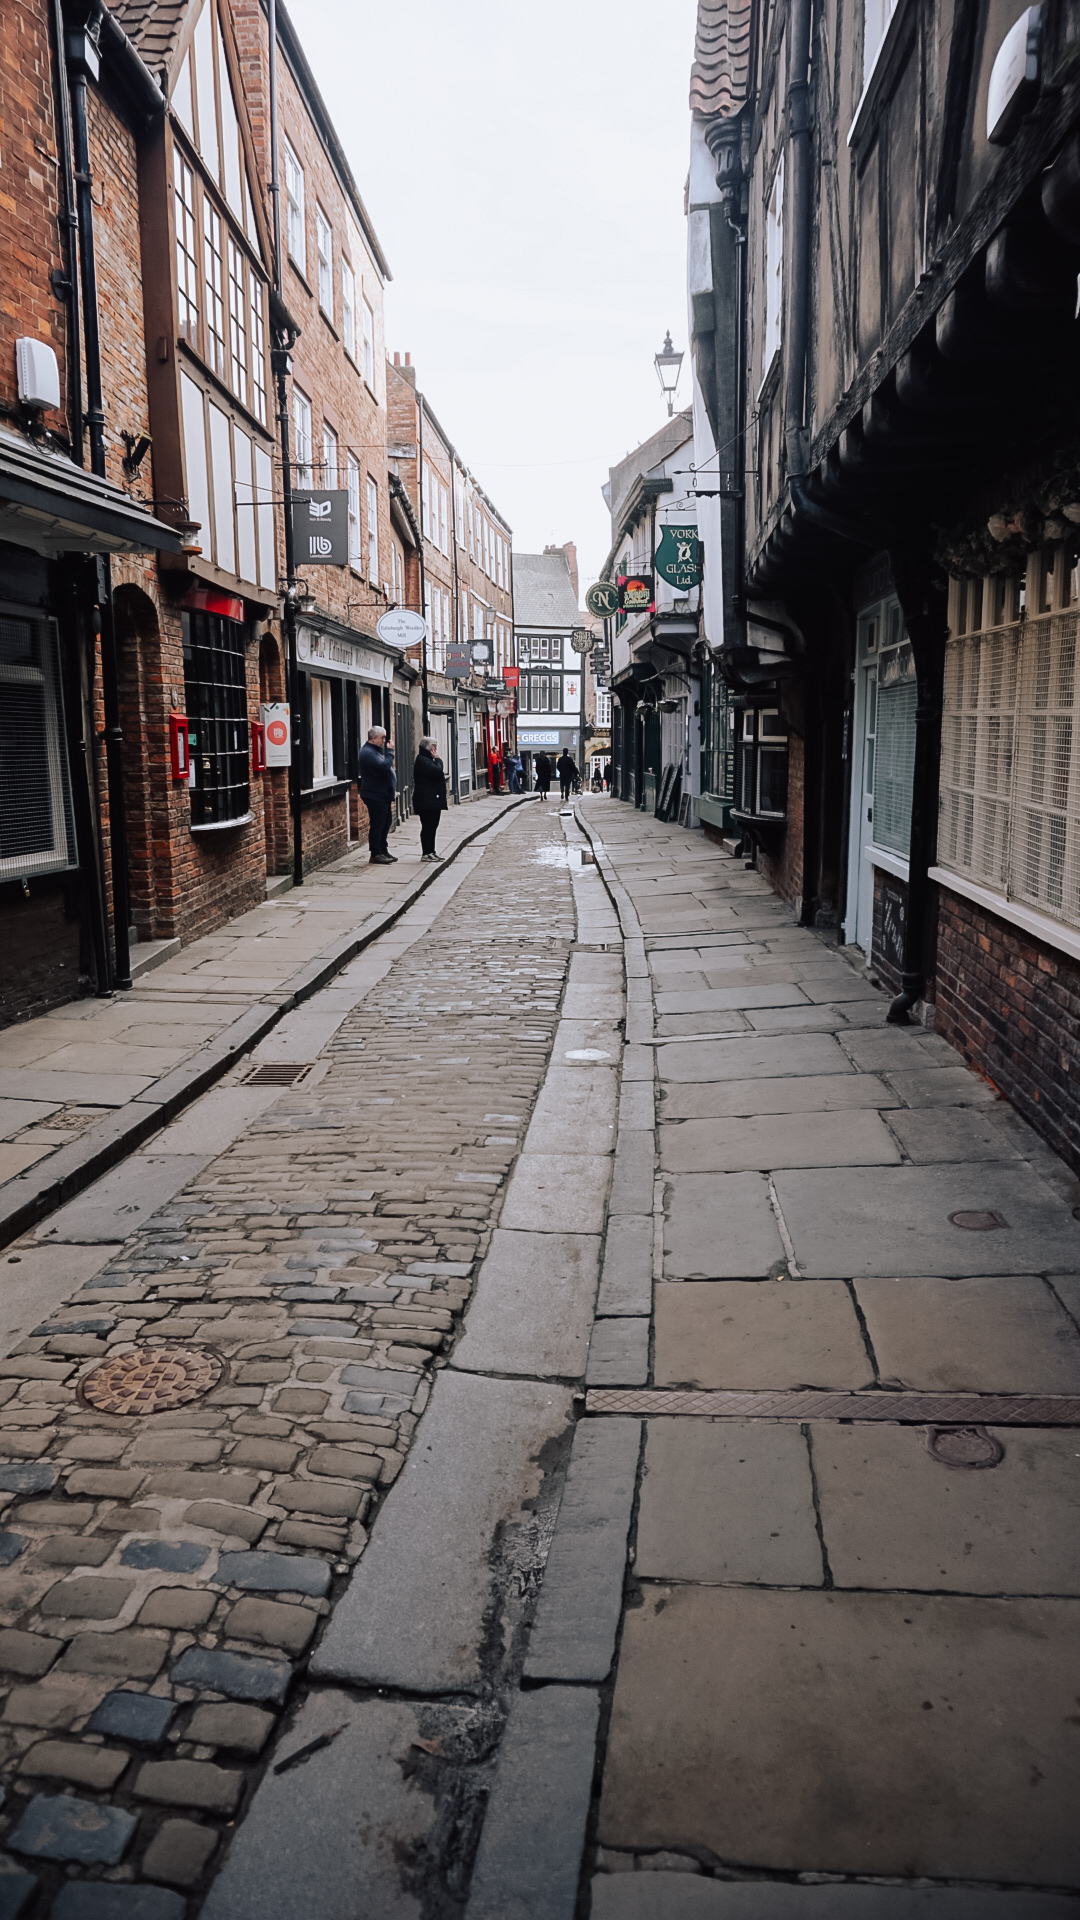 Exploring City of York The Shambles